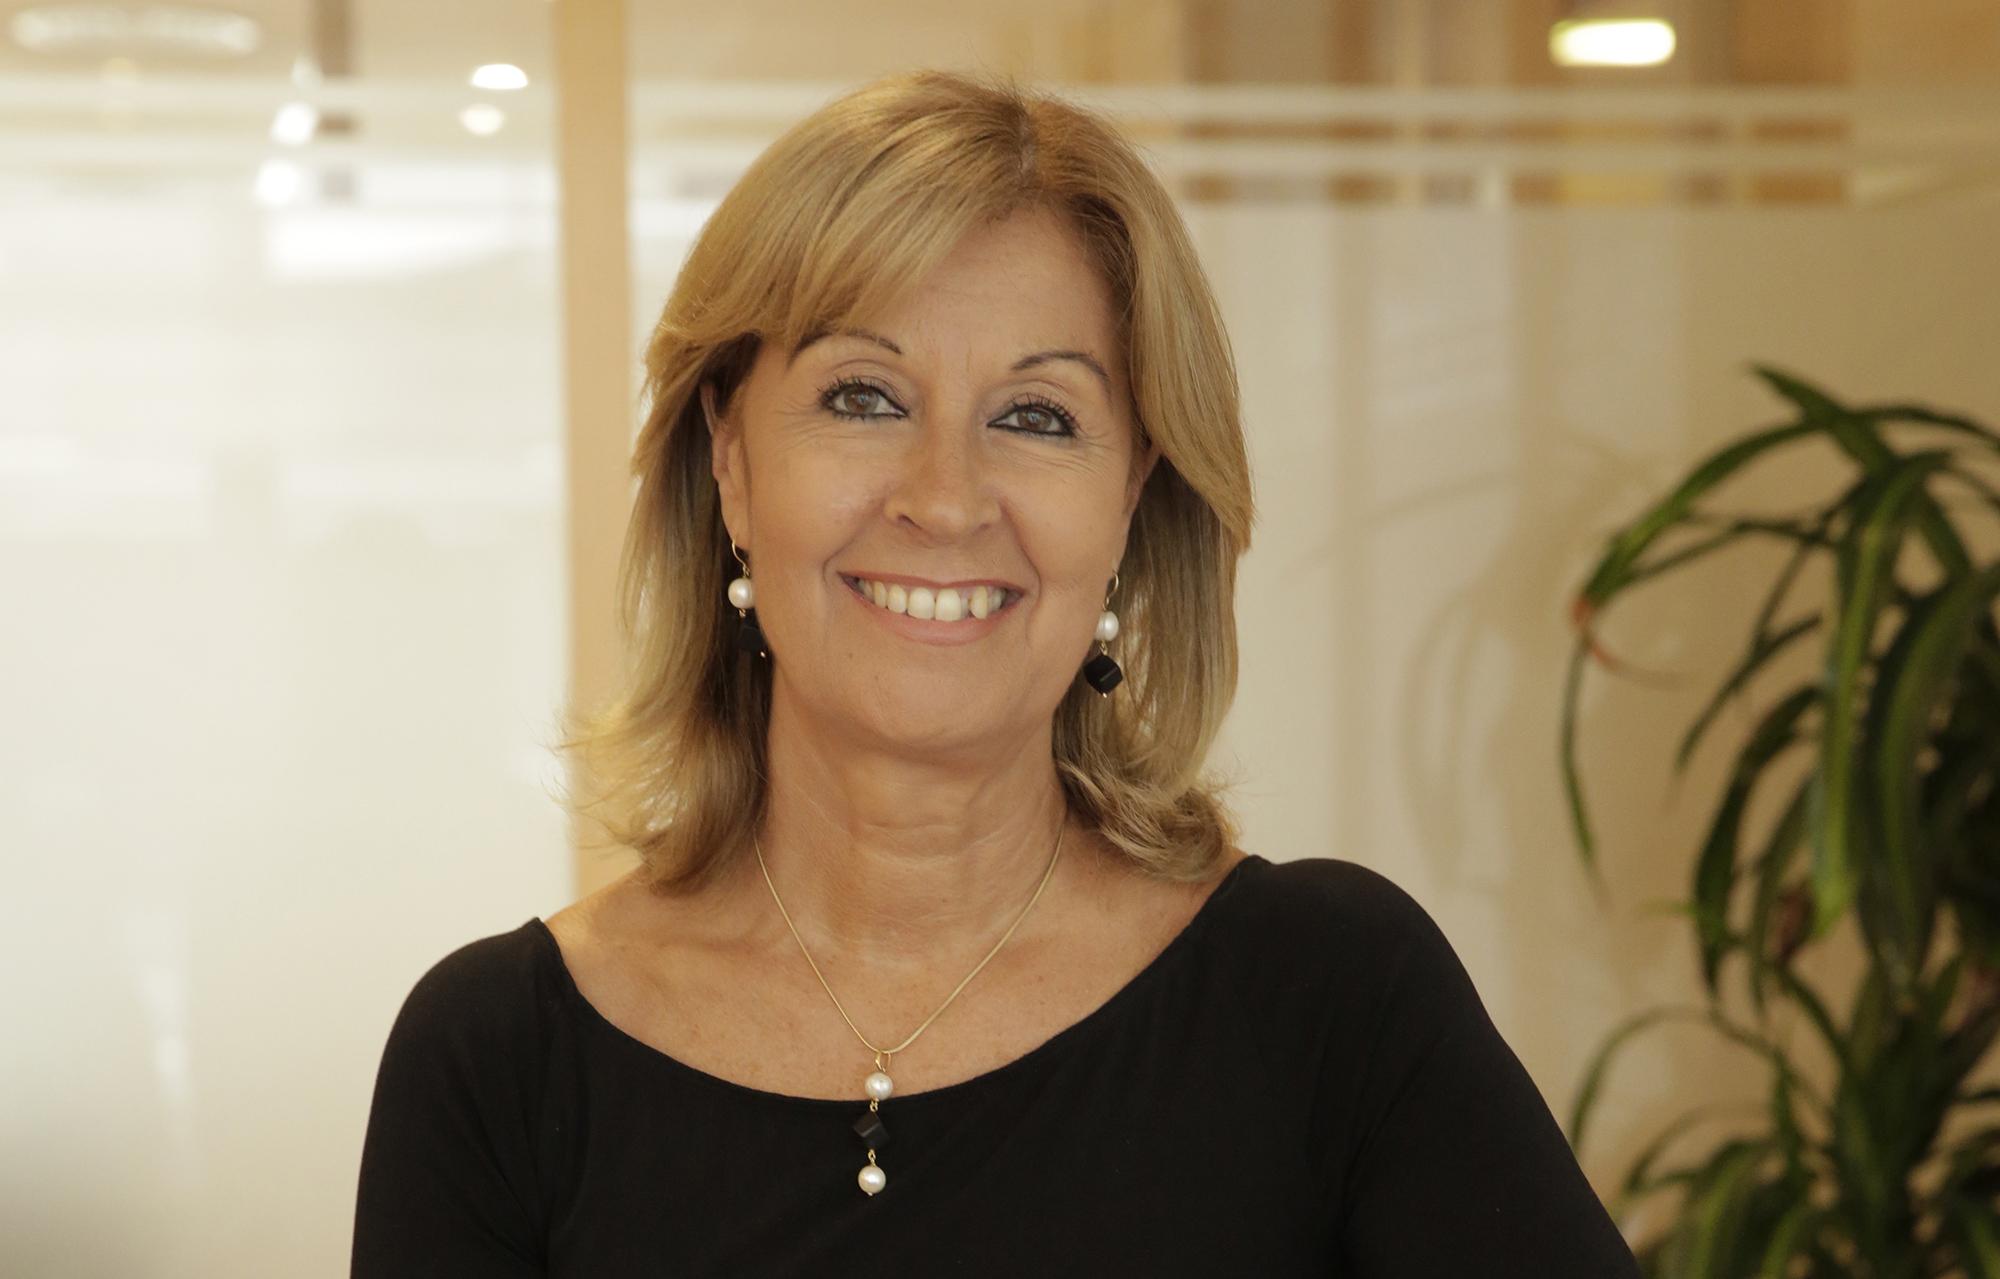 Montse Castilla Habla Sobre Assessment En Equipos & Talento